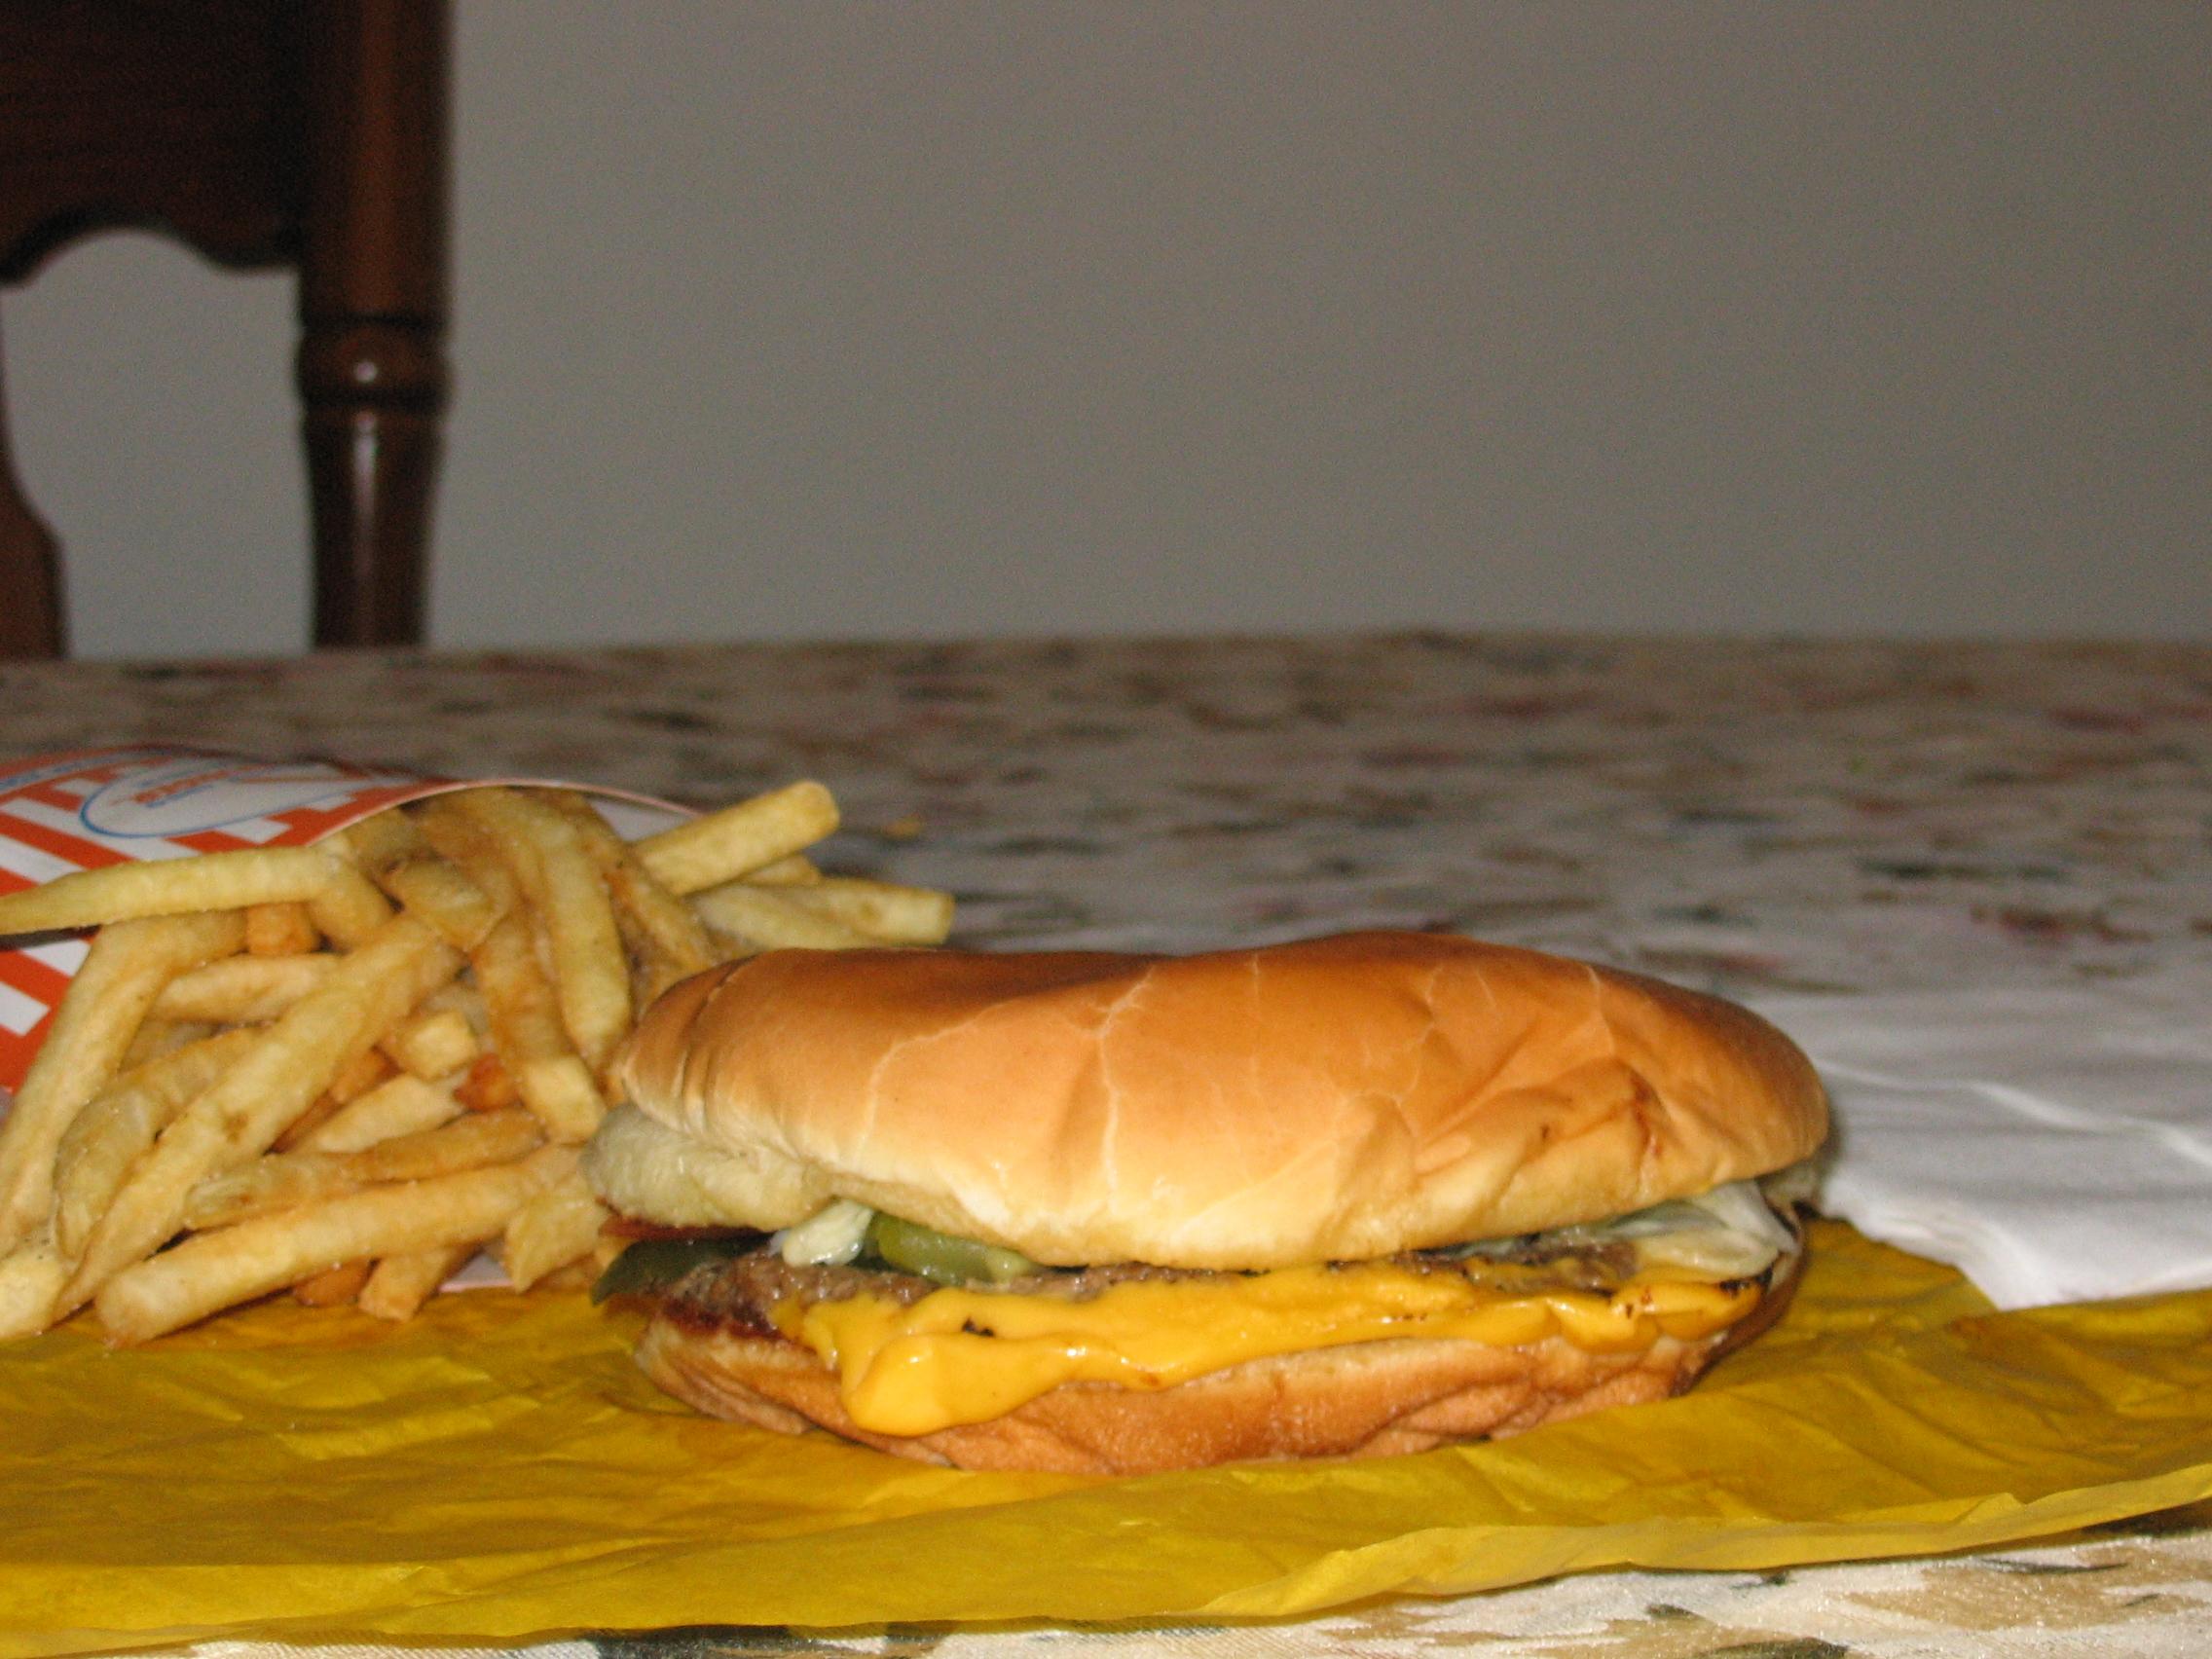 File:Whataburger hamburger and fries.jpg - Wikimedia Commons